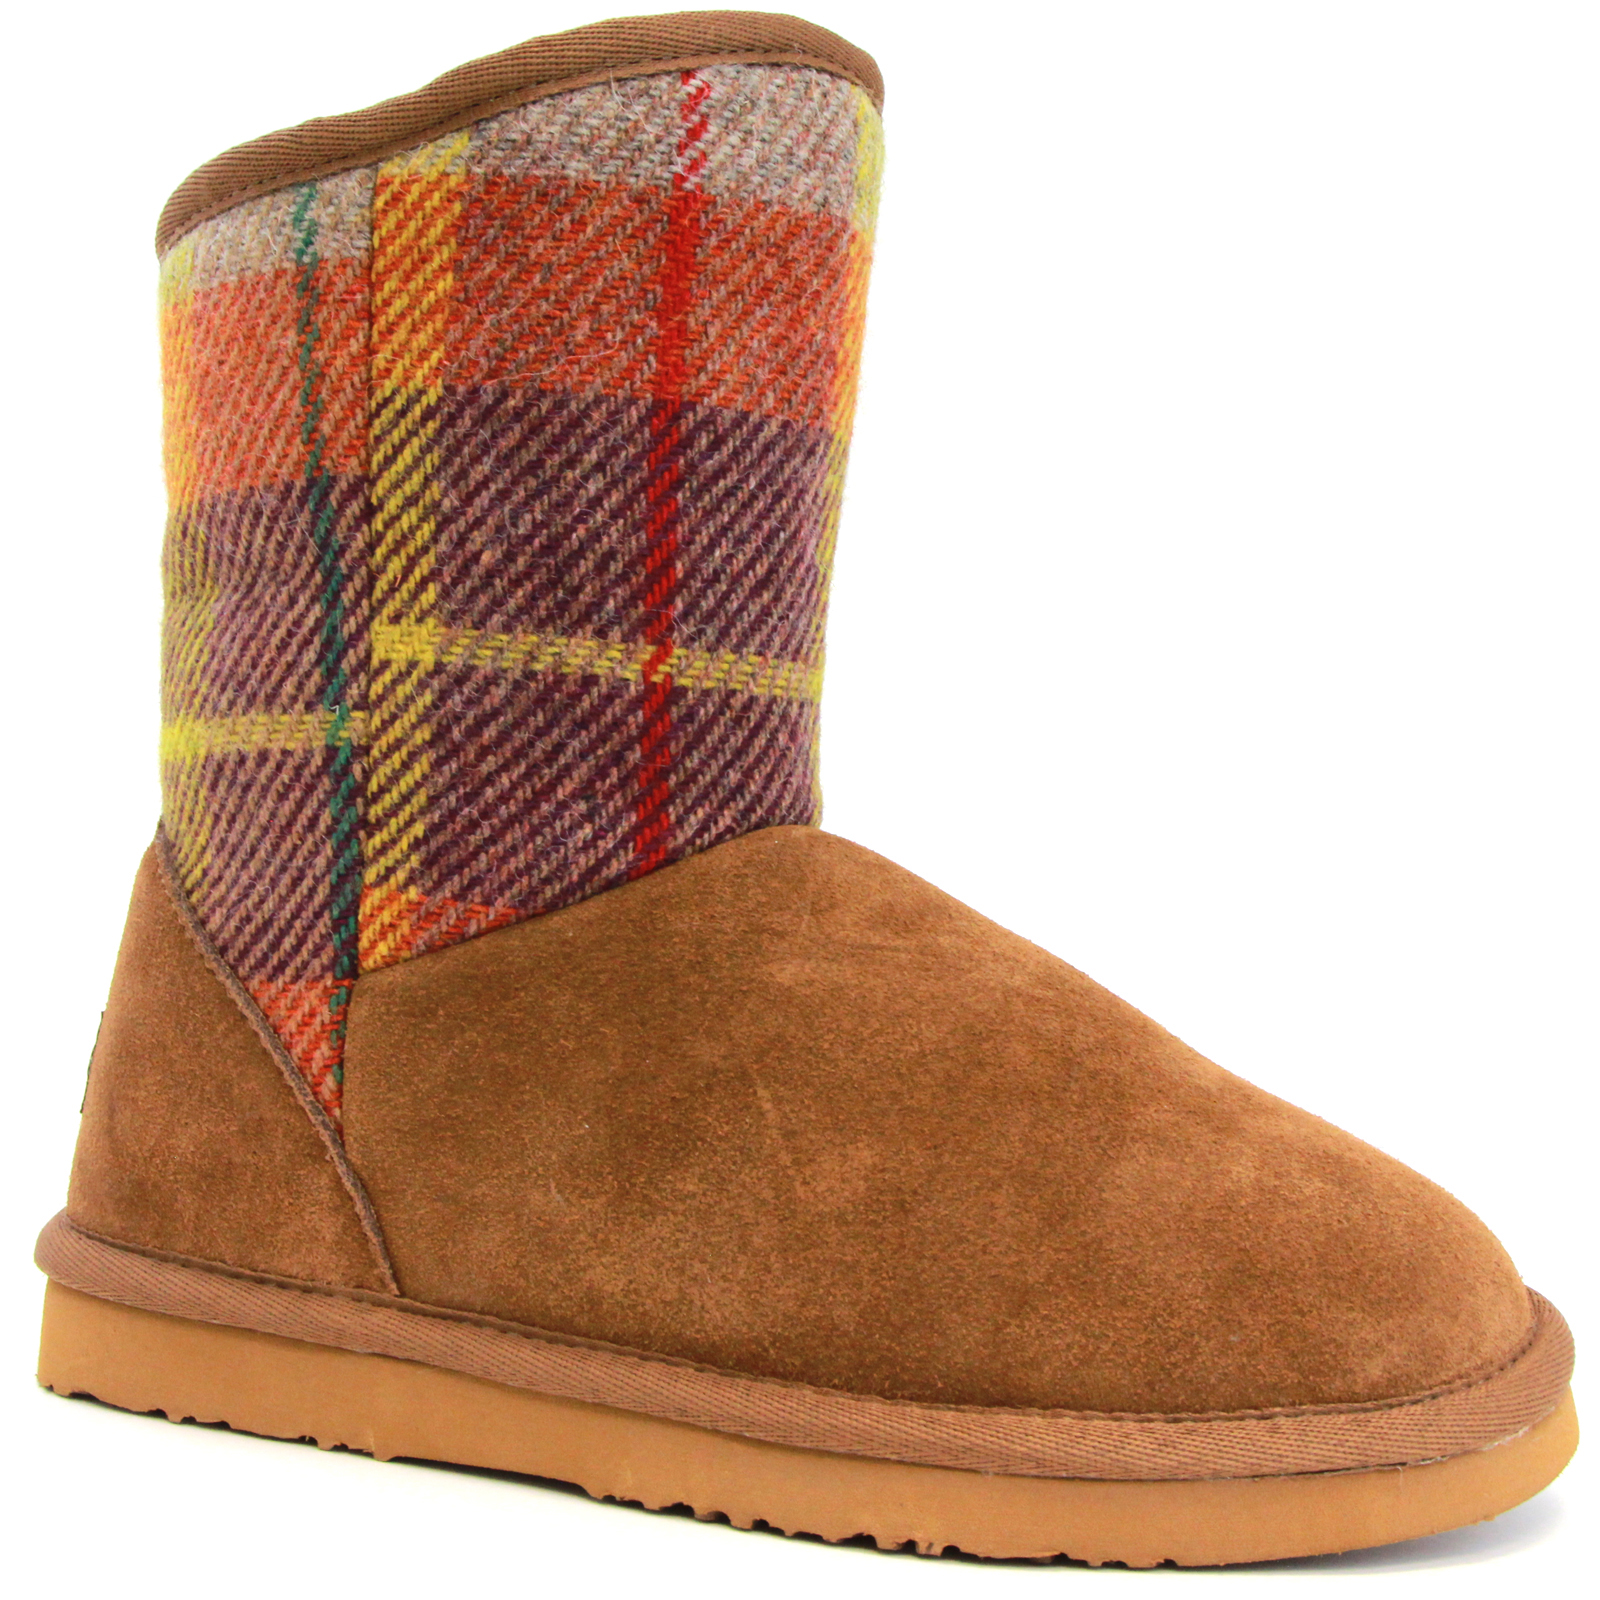 Lamo Wembley Kid's Boot by